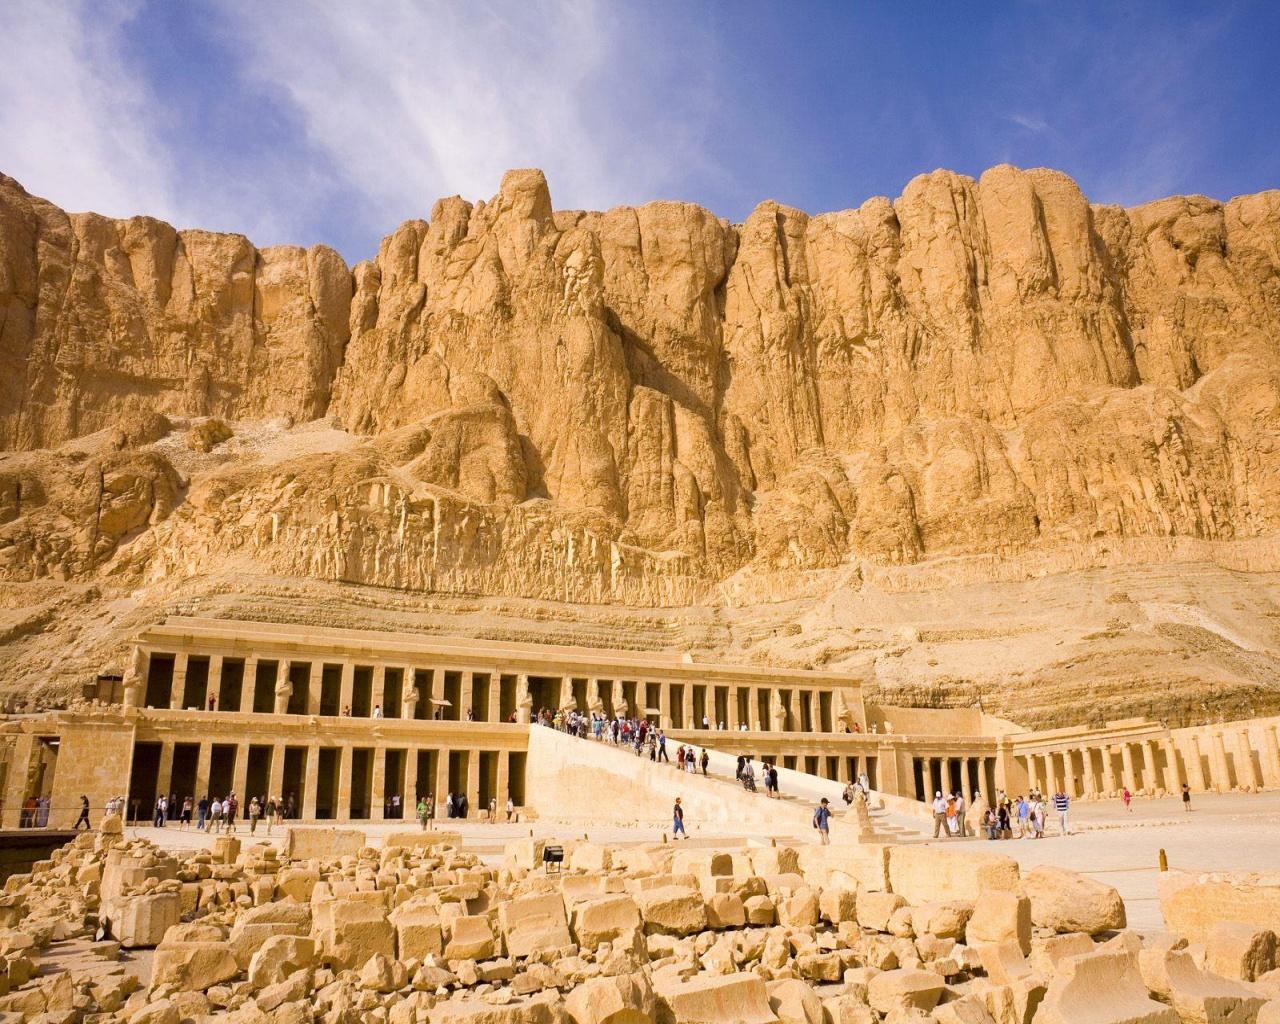 1280x1024 Queen Hatshepsut Temple Egypt desktop PC and Mac wallpaper 1280x1024